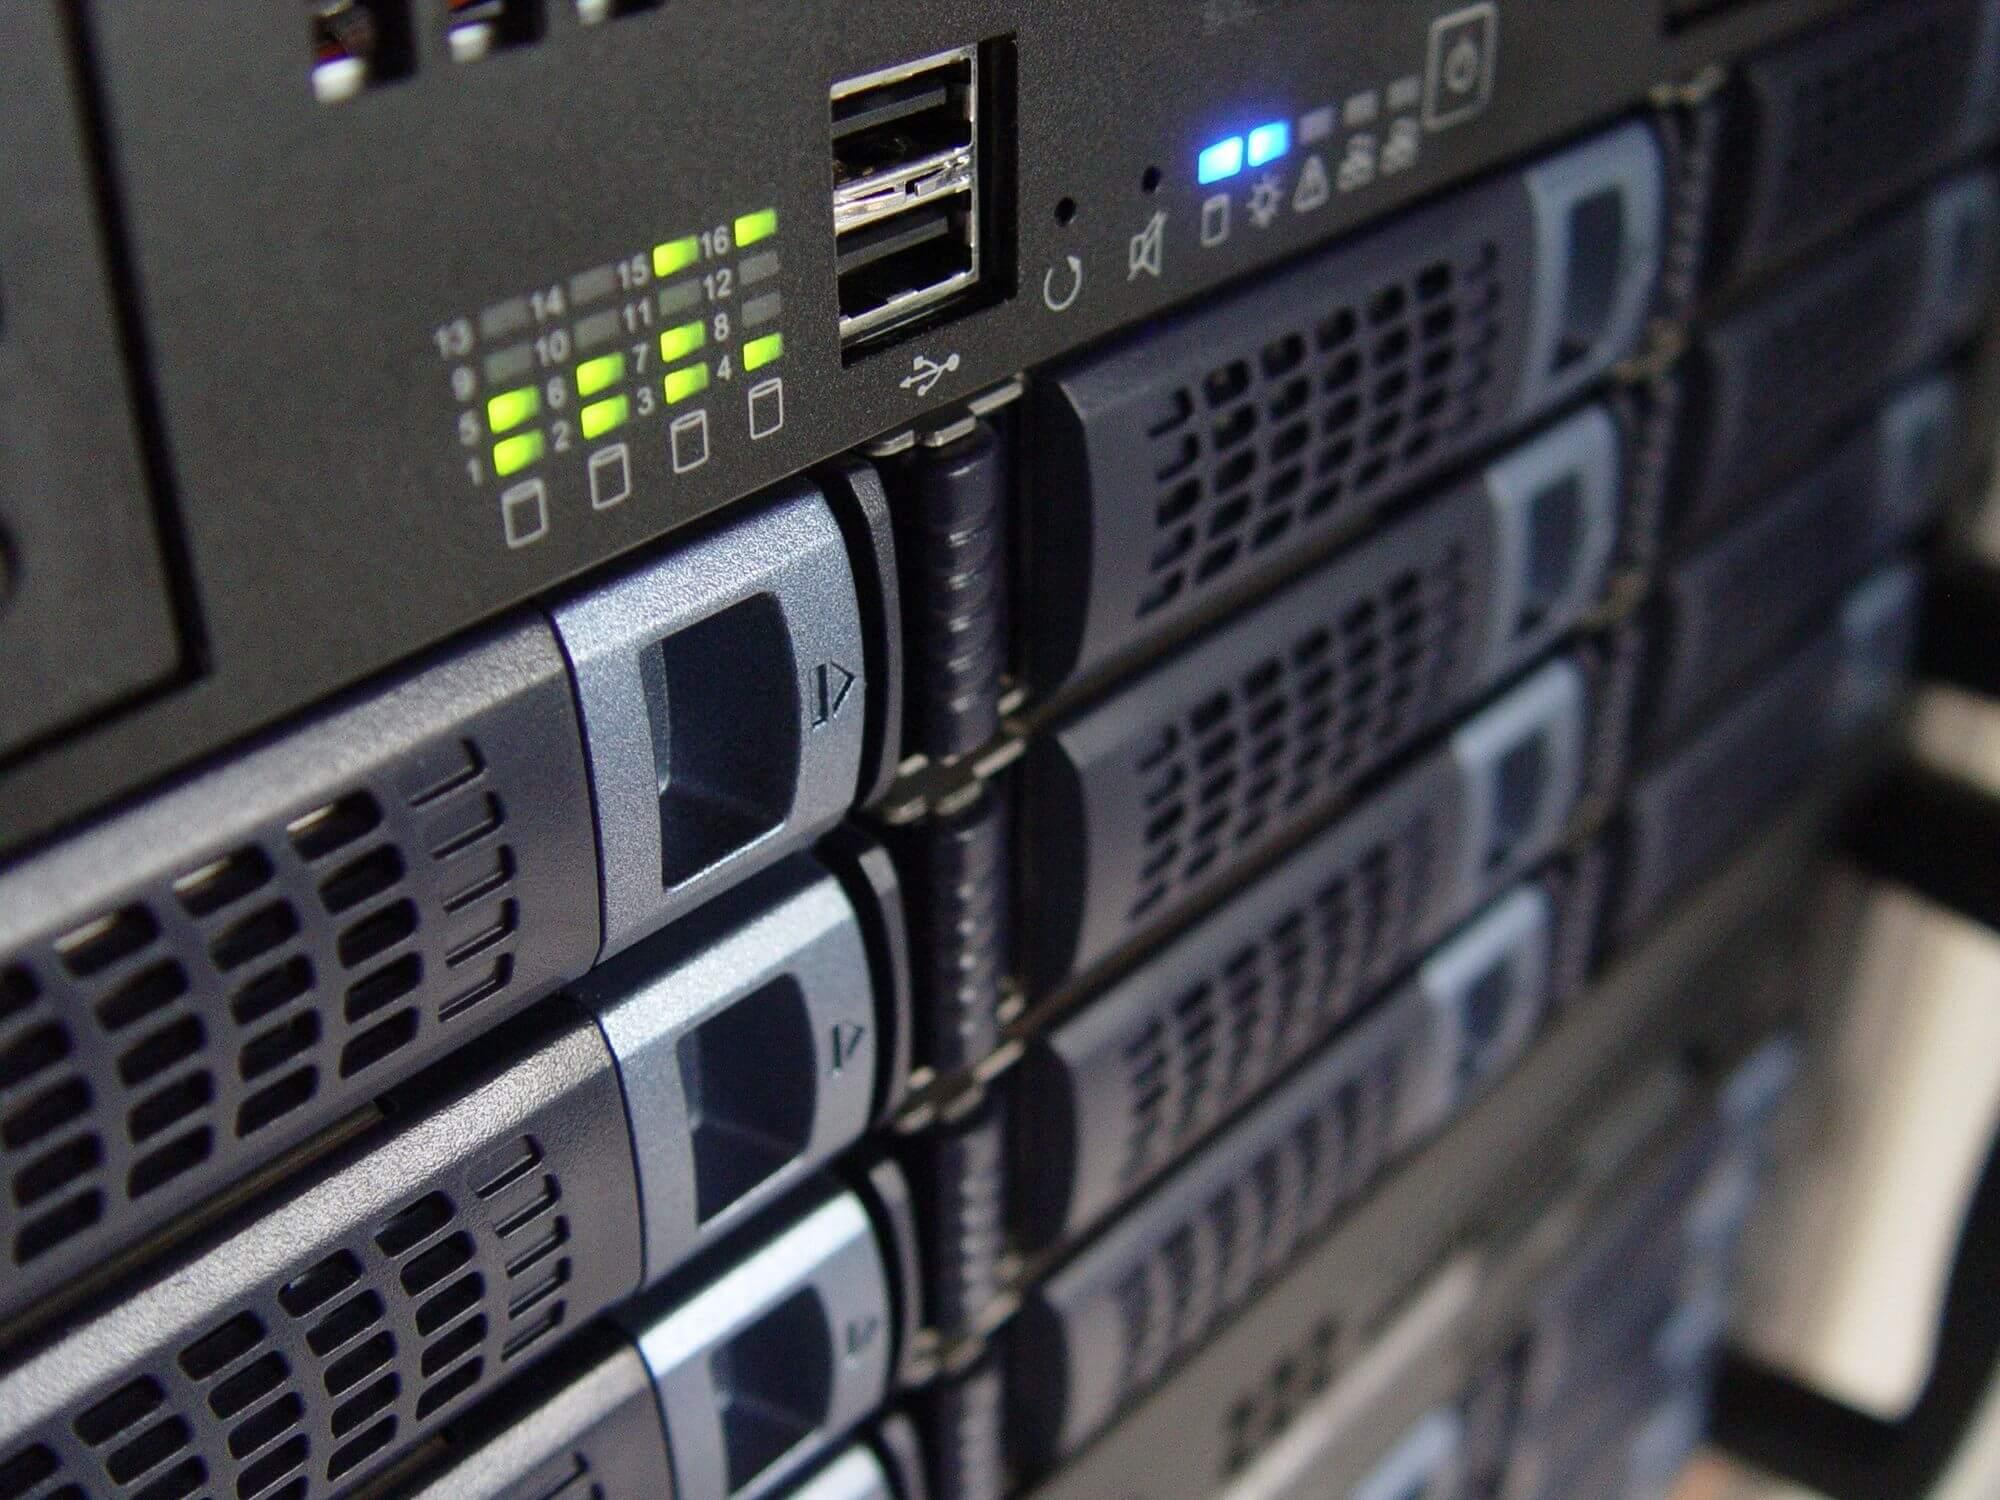 Descubra 5 vantagens do servidor dedicado